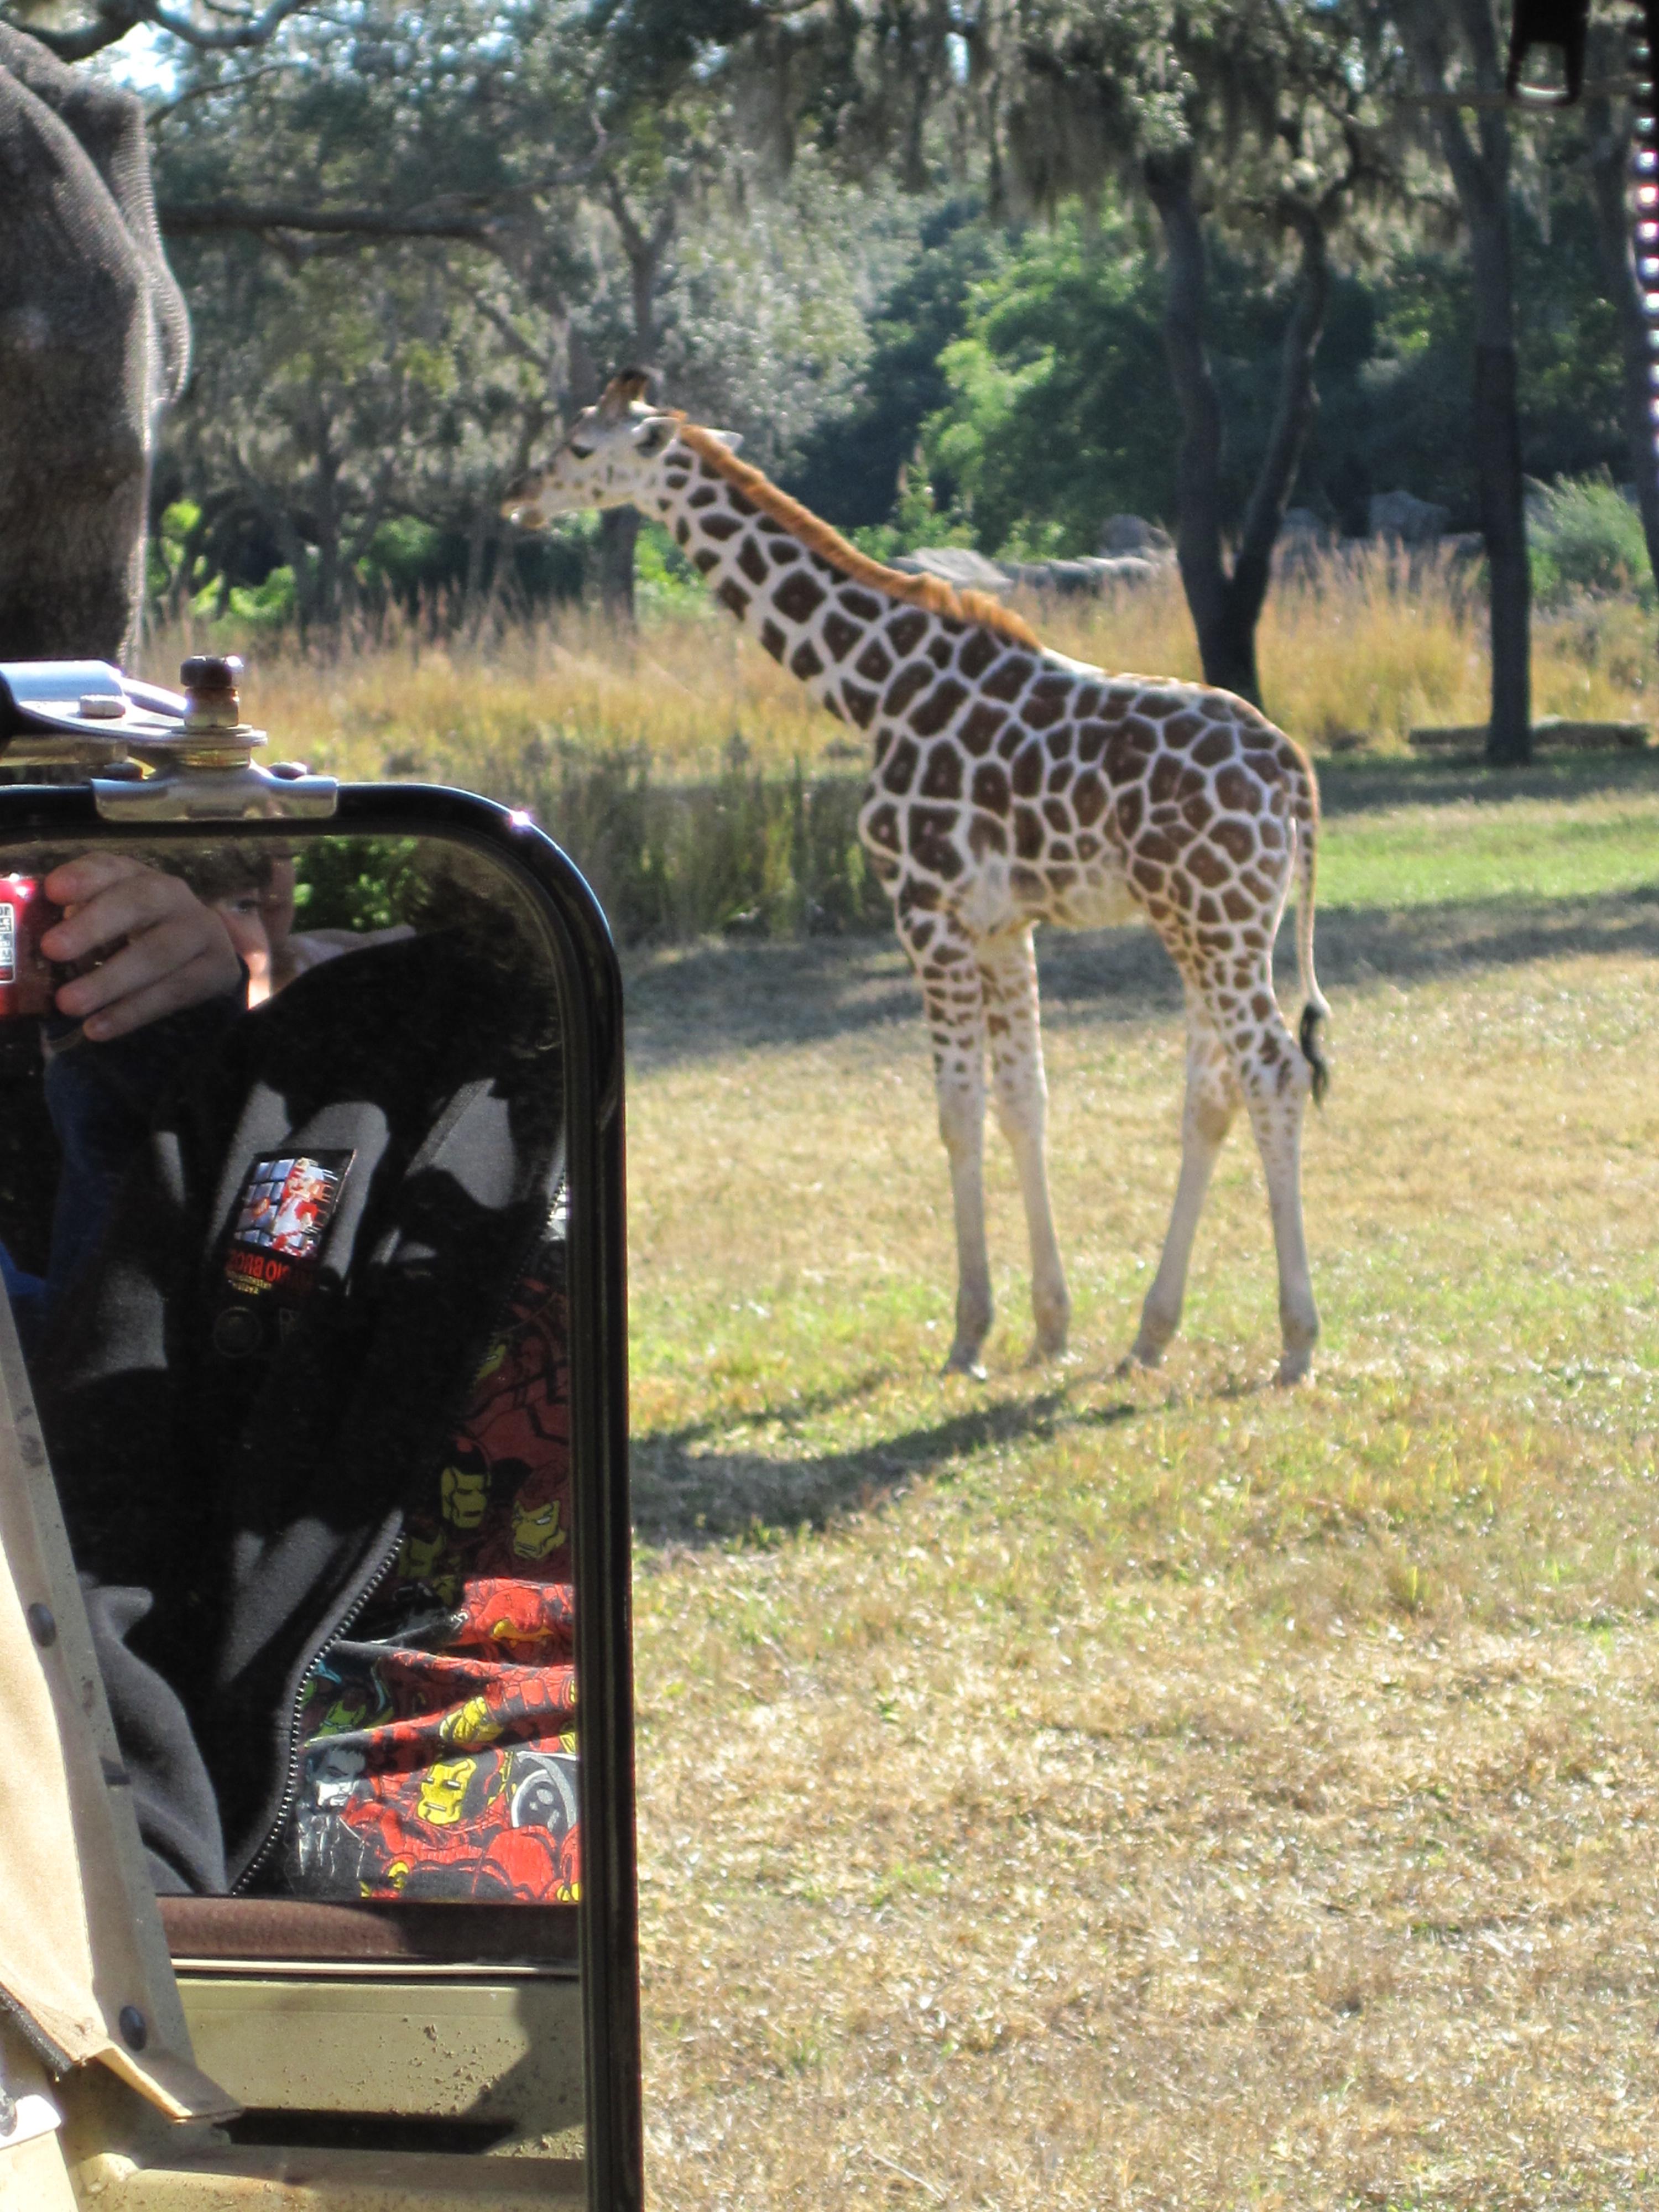 giraffe on kilimanjaro safaris - fastpass tiers recommendation